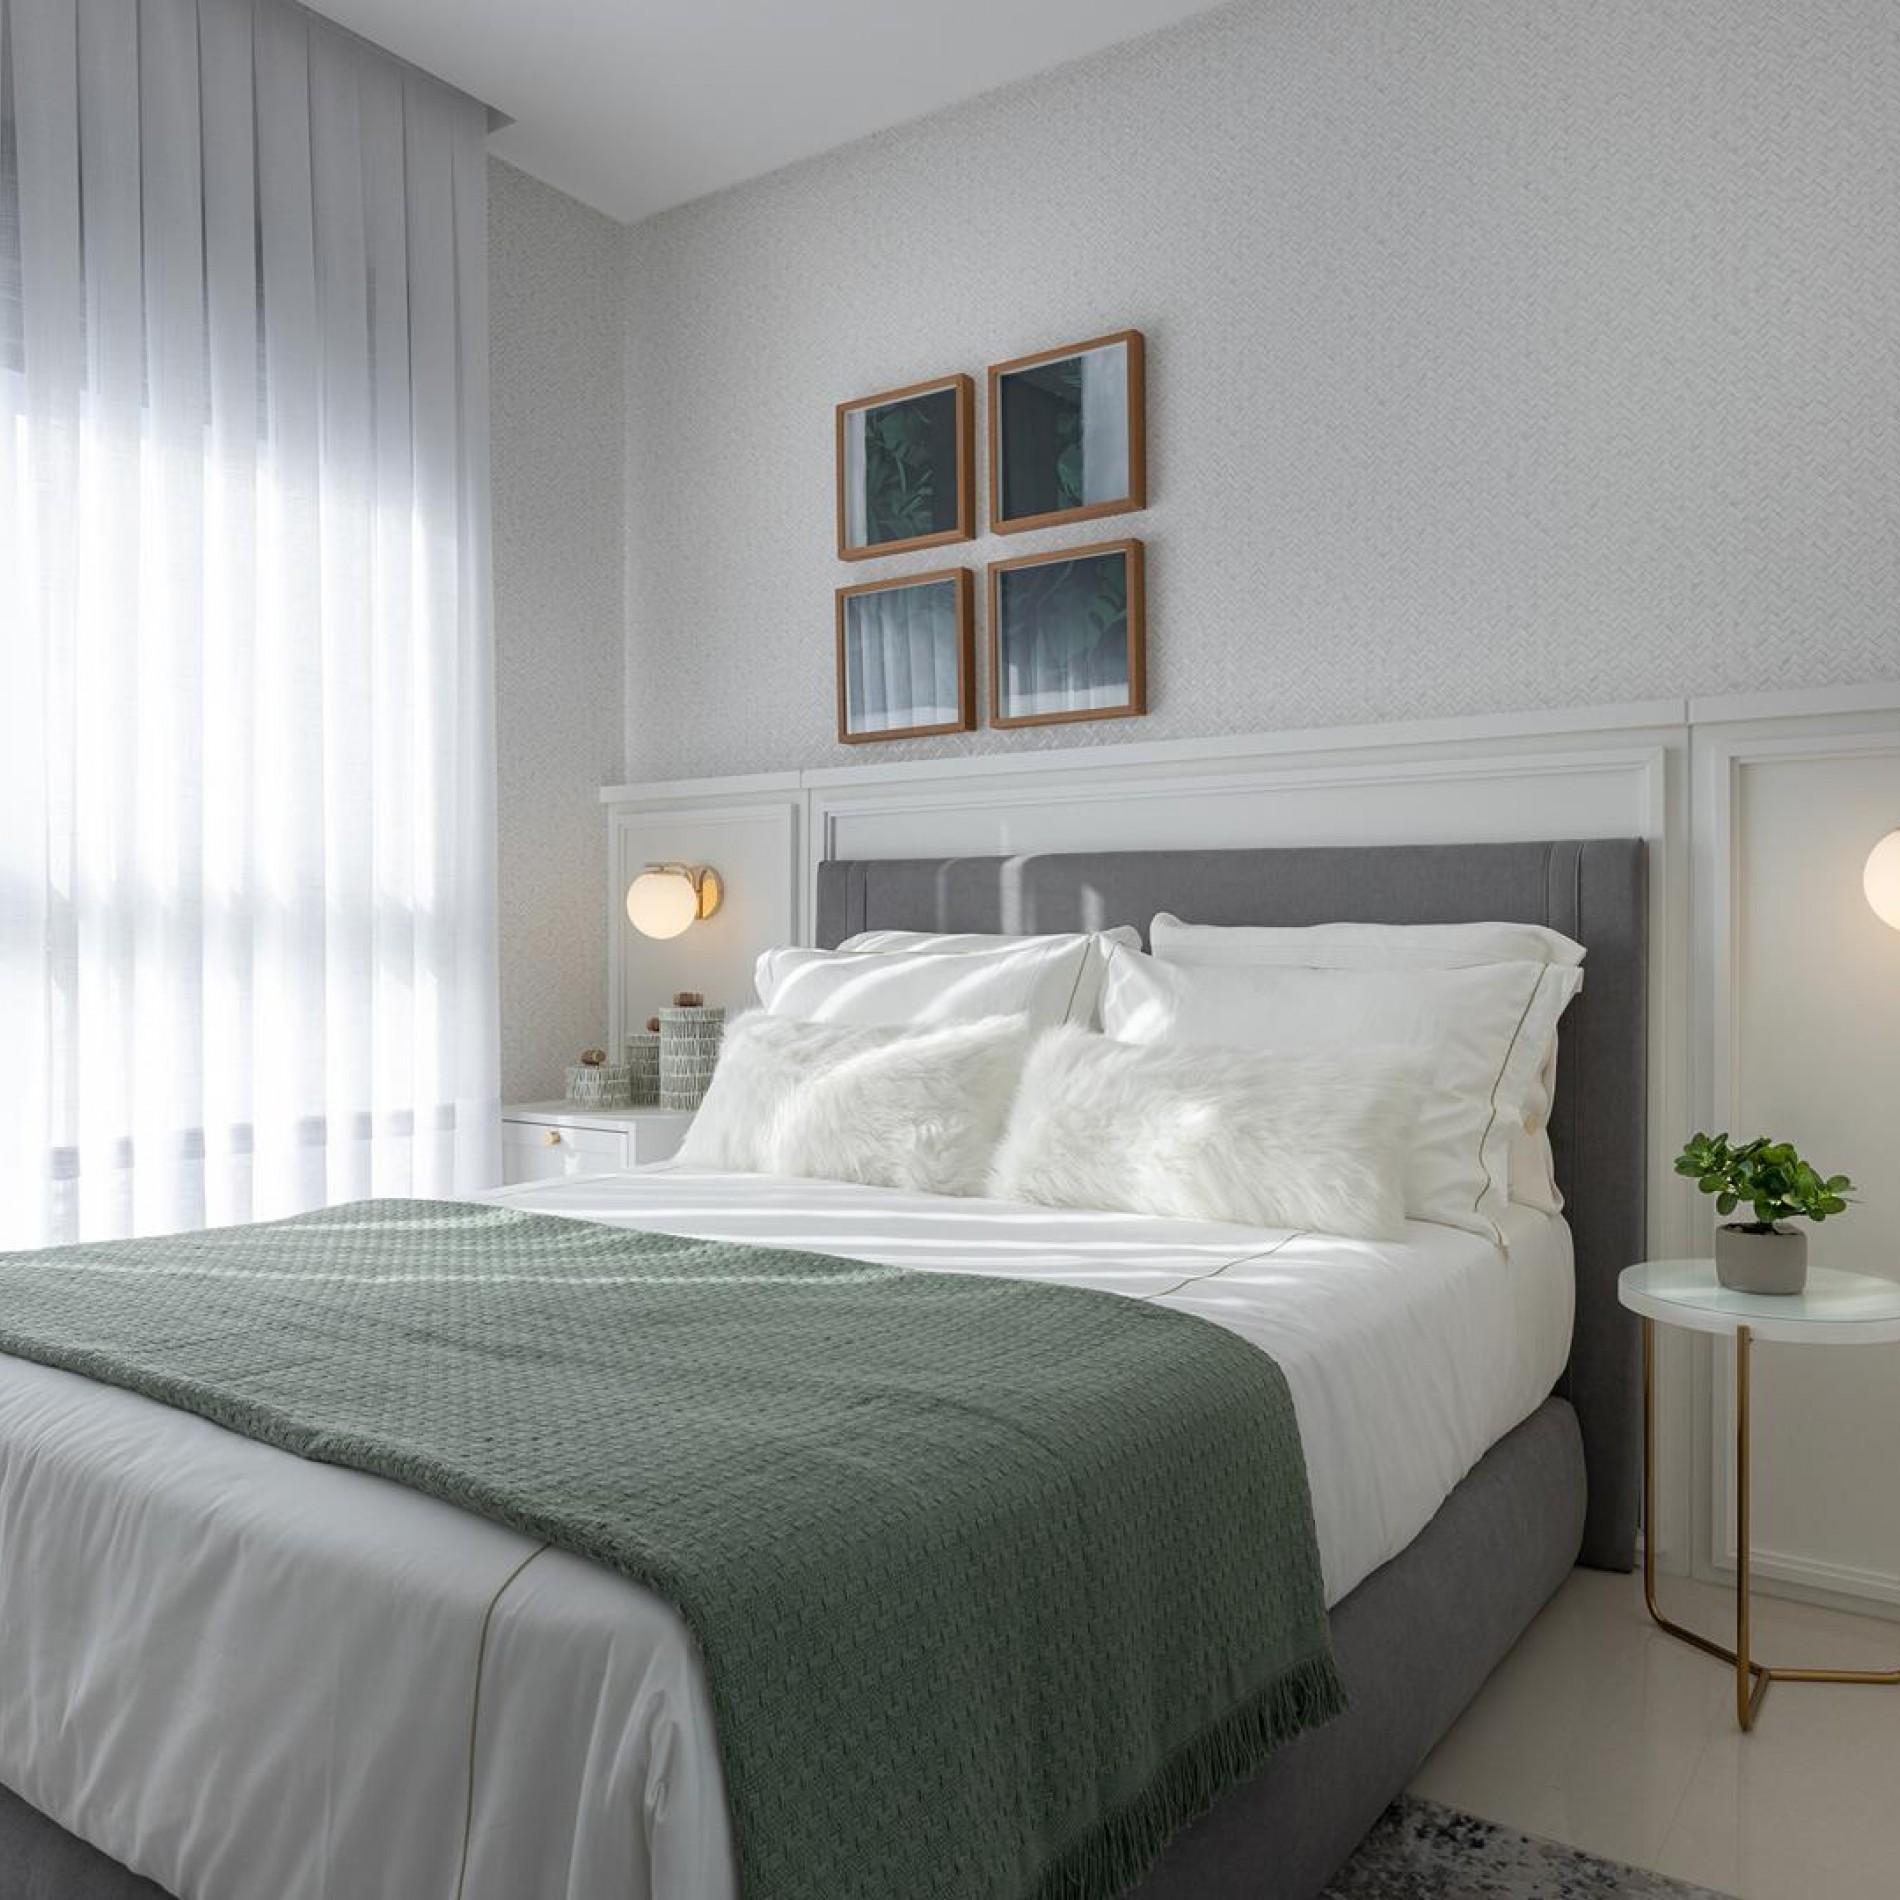 new-york-apartments-decorado-302-suite-2-28.jpg